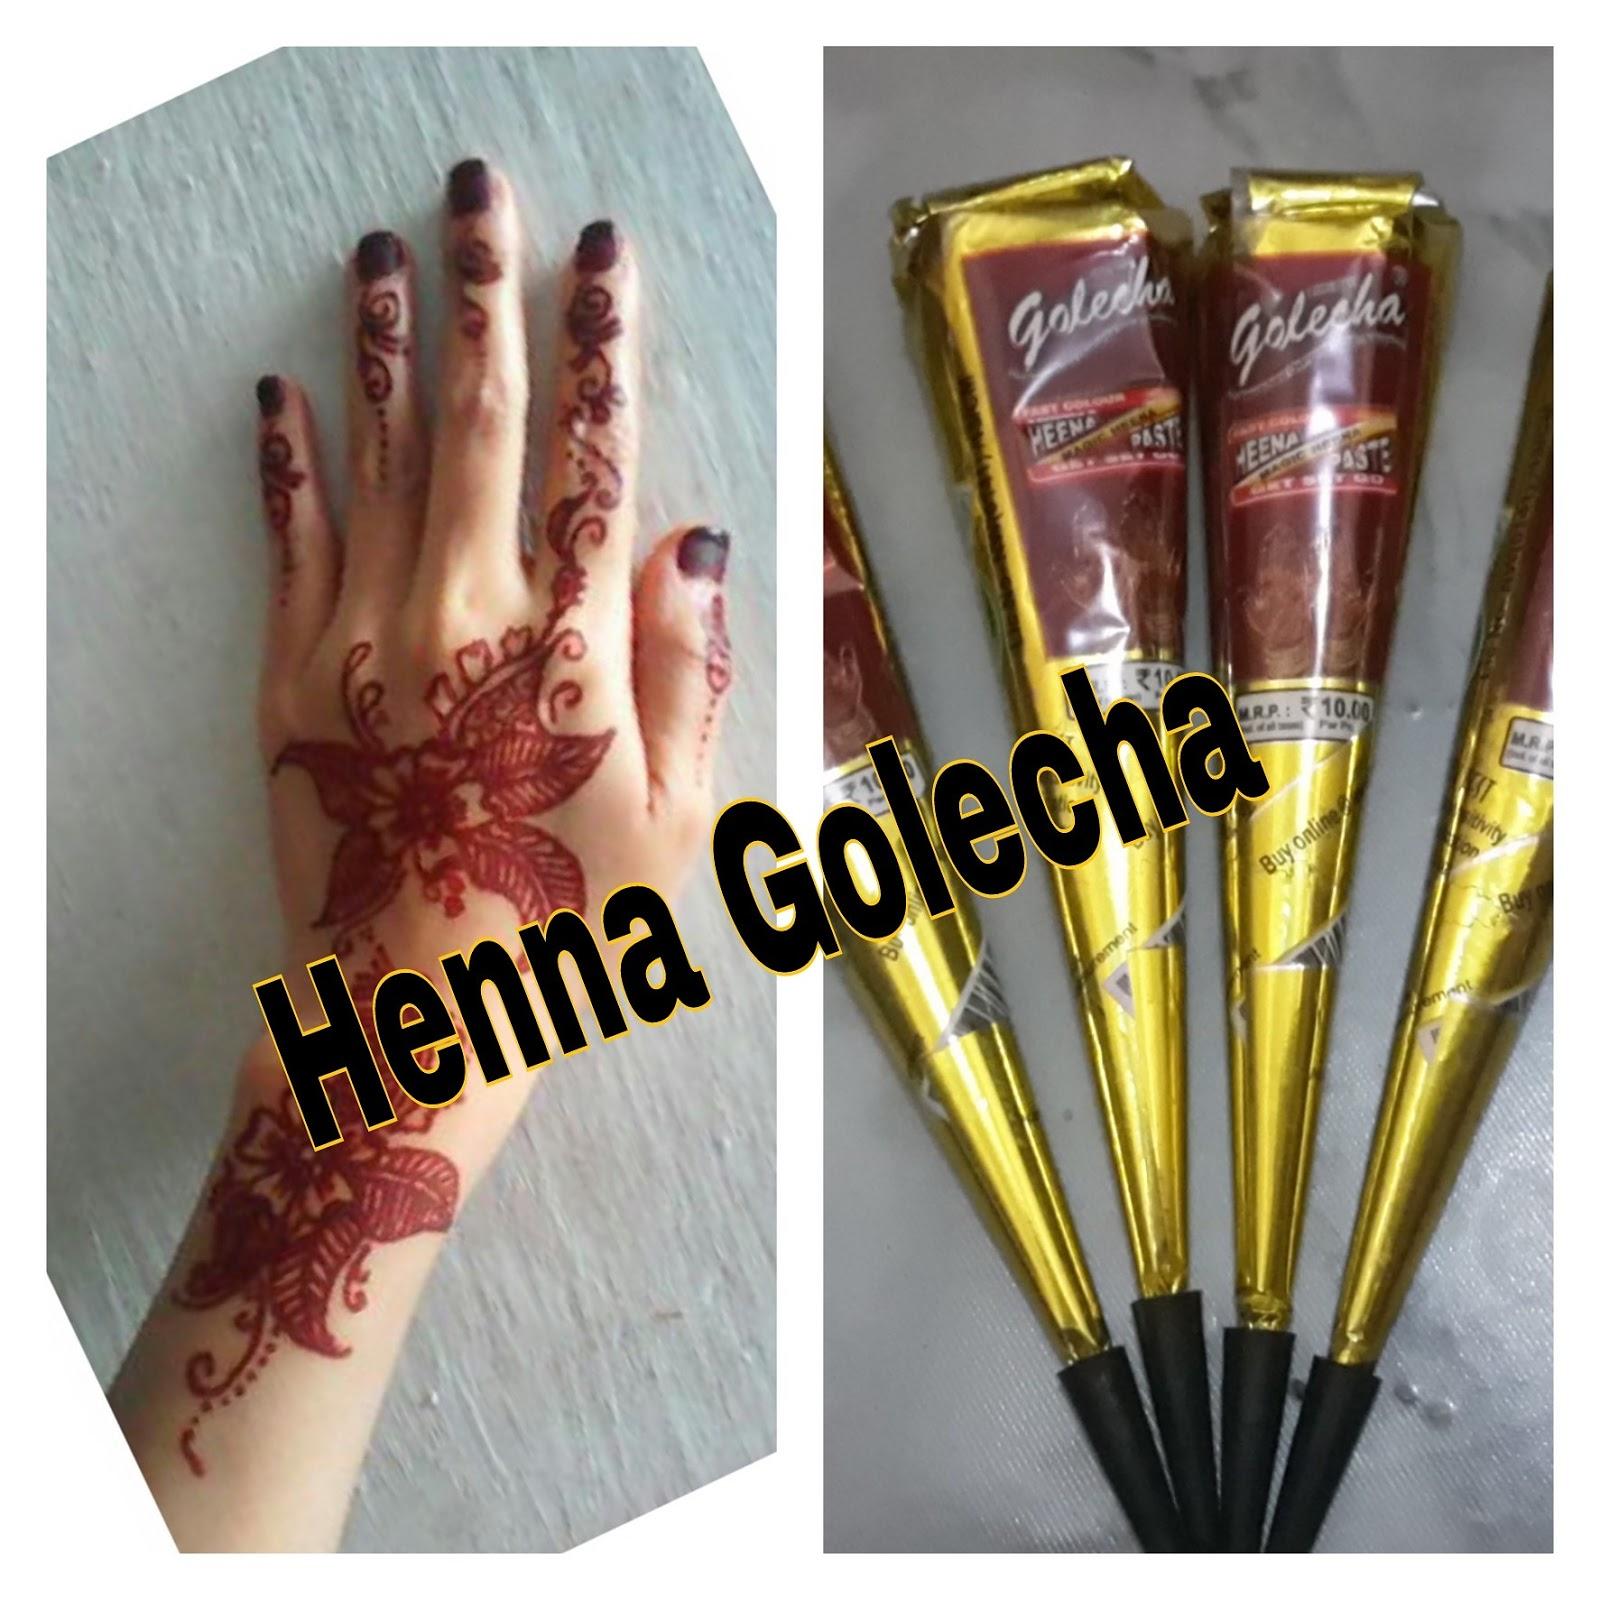 Henna Golecha India